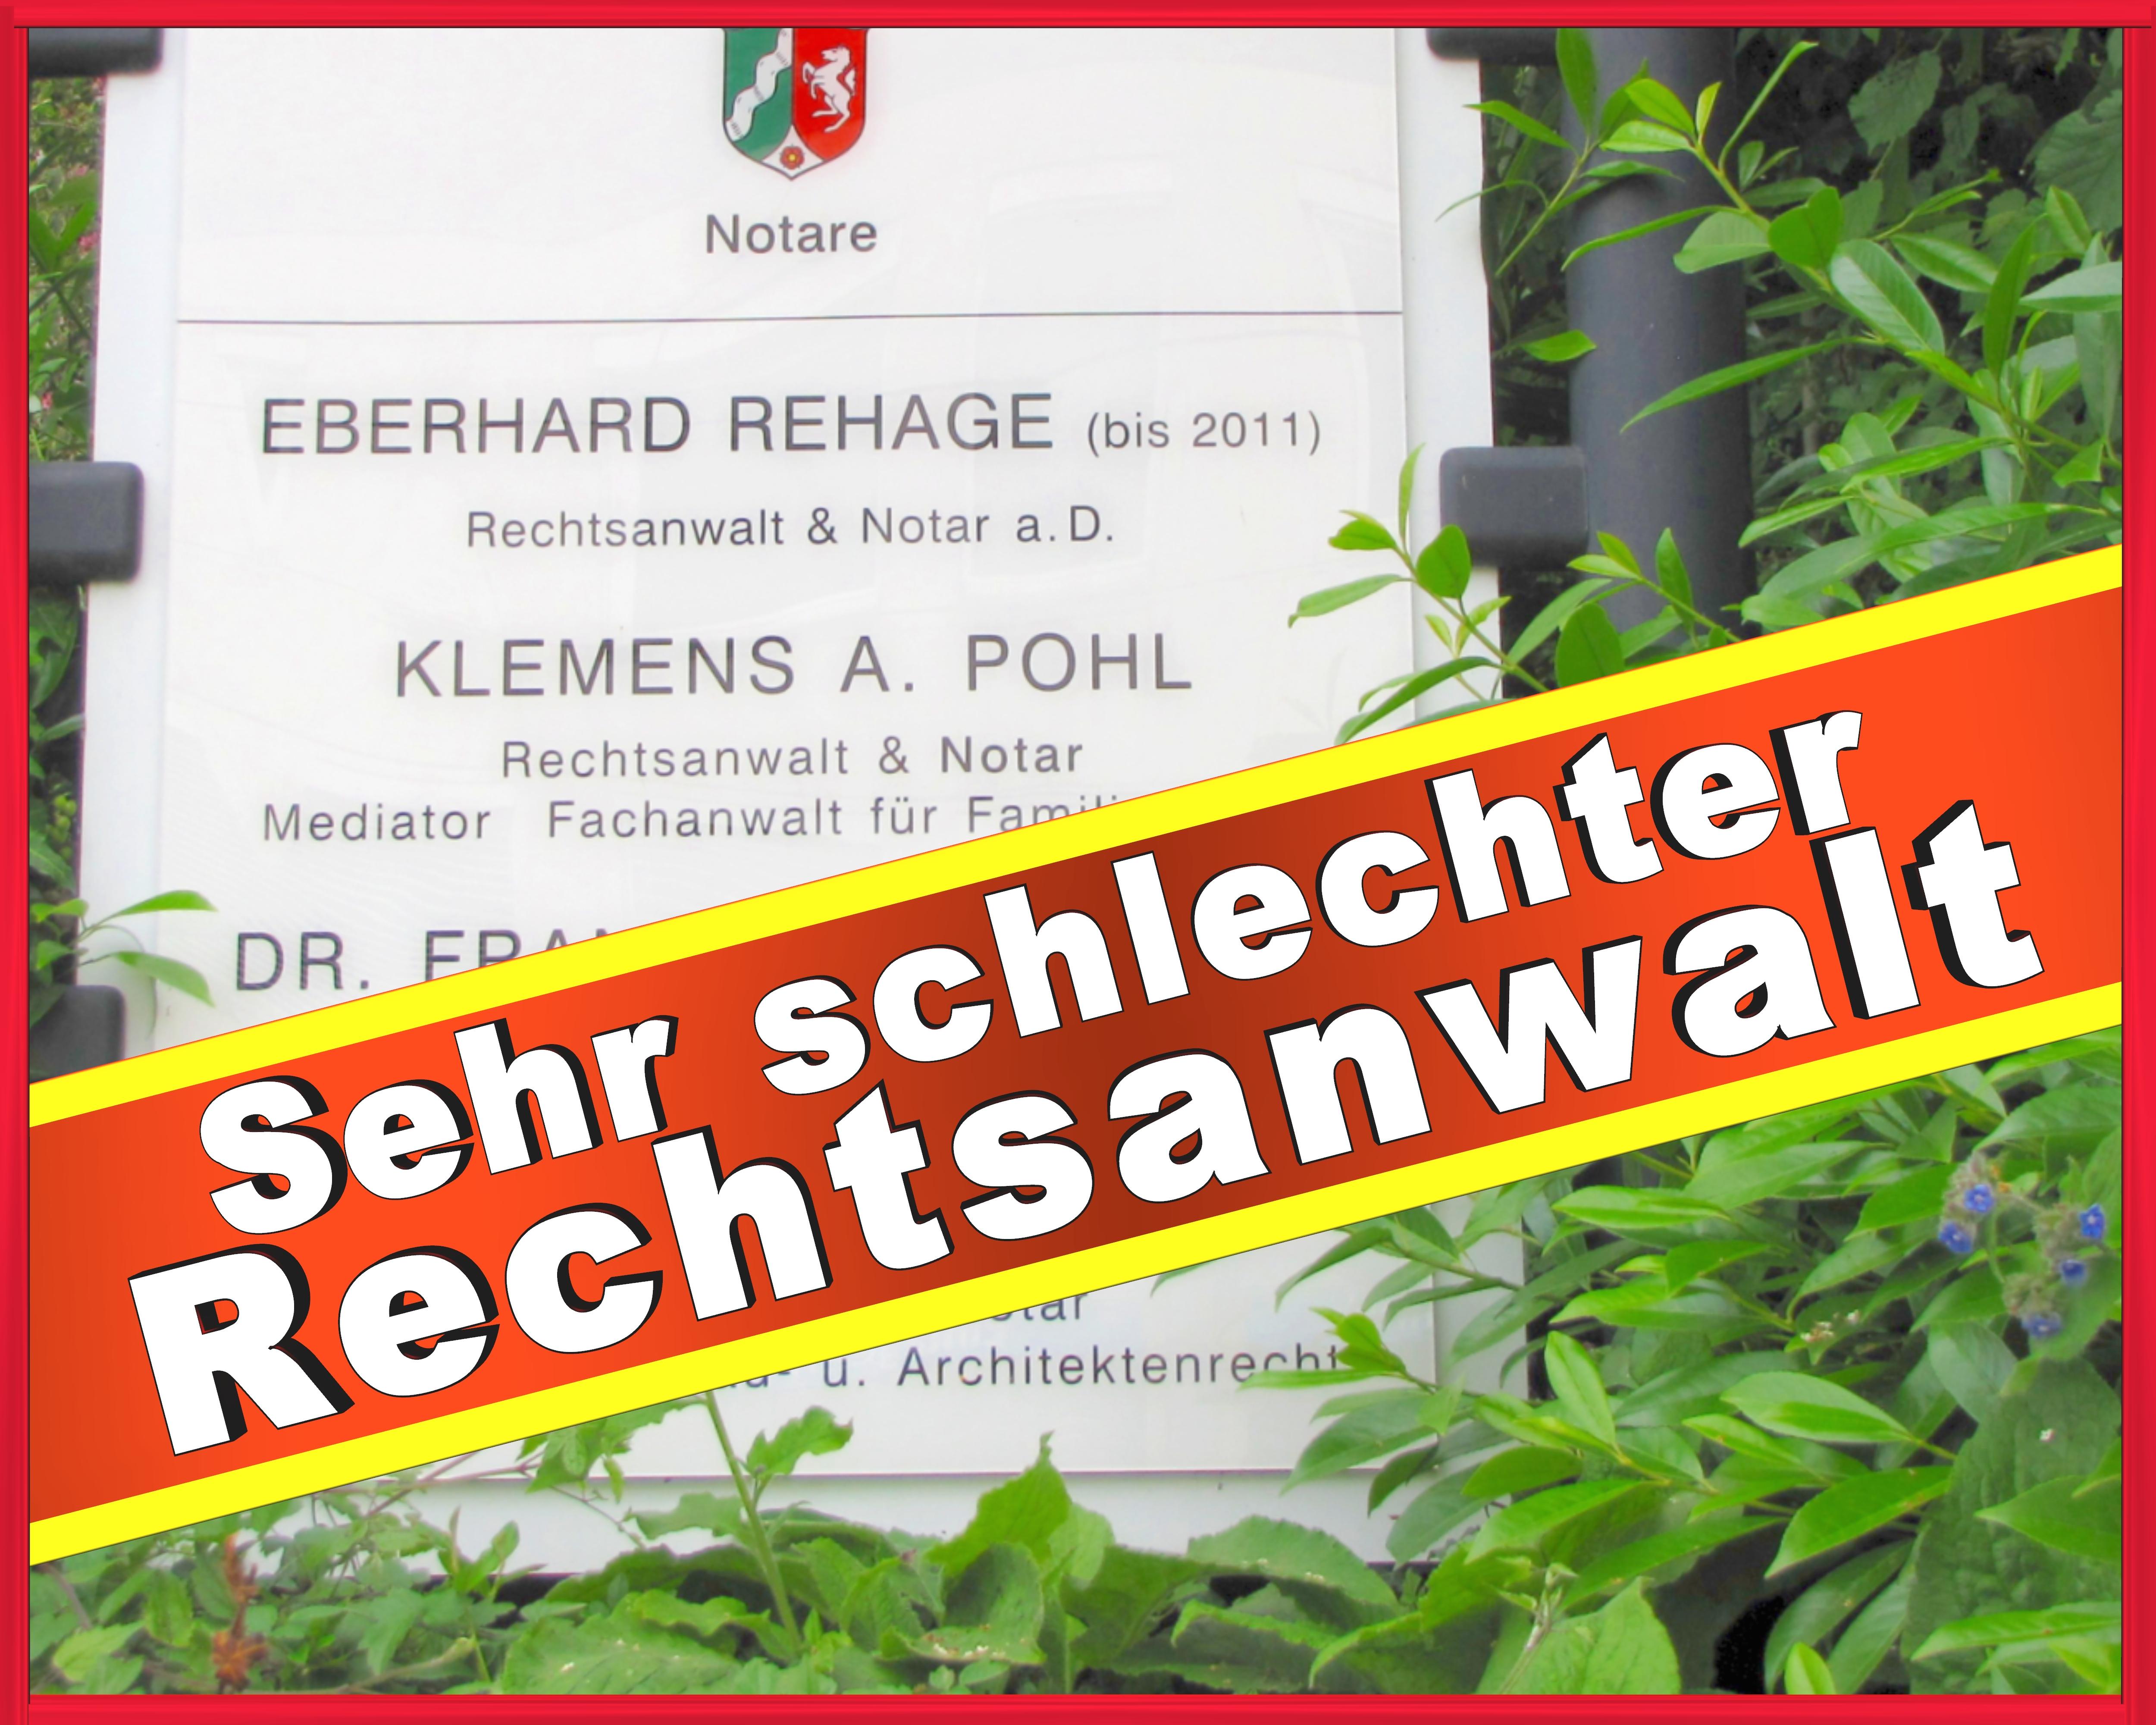 Rechtsanwalt Klemens Pohl (1)